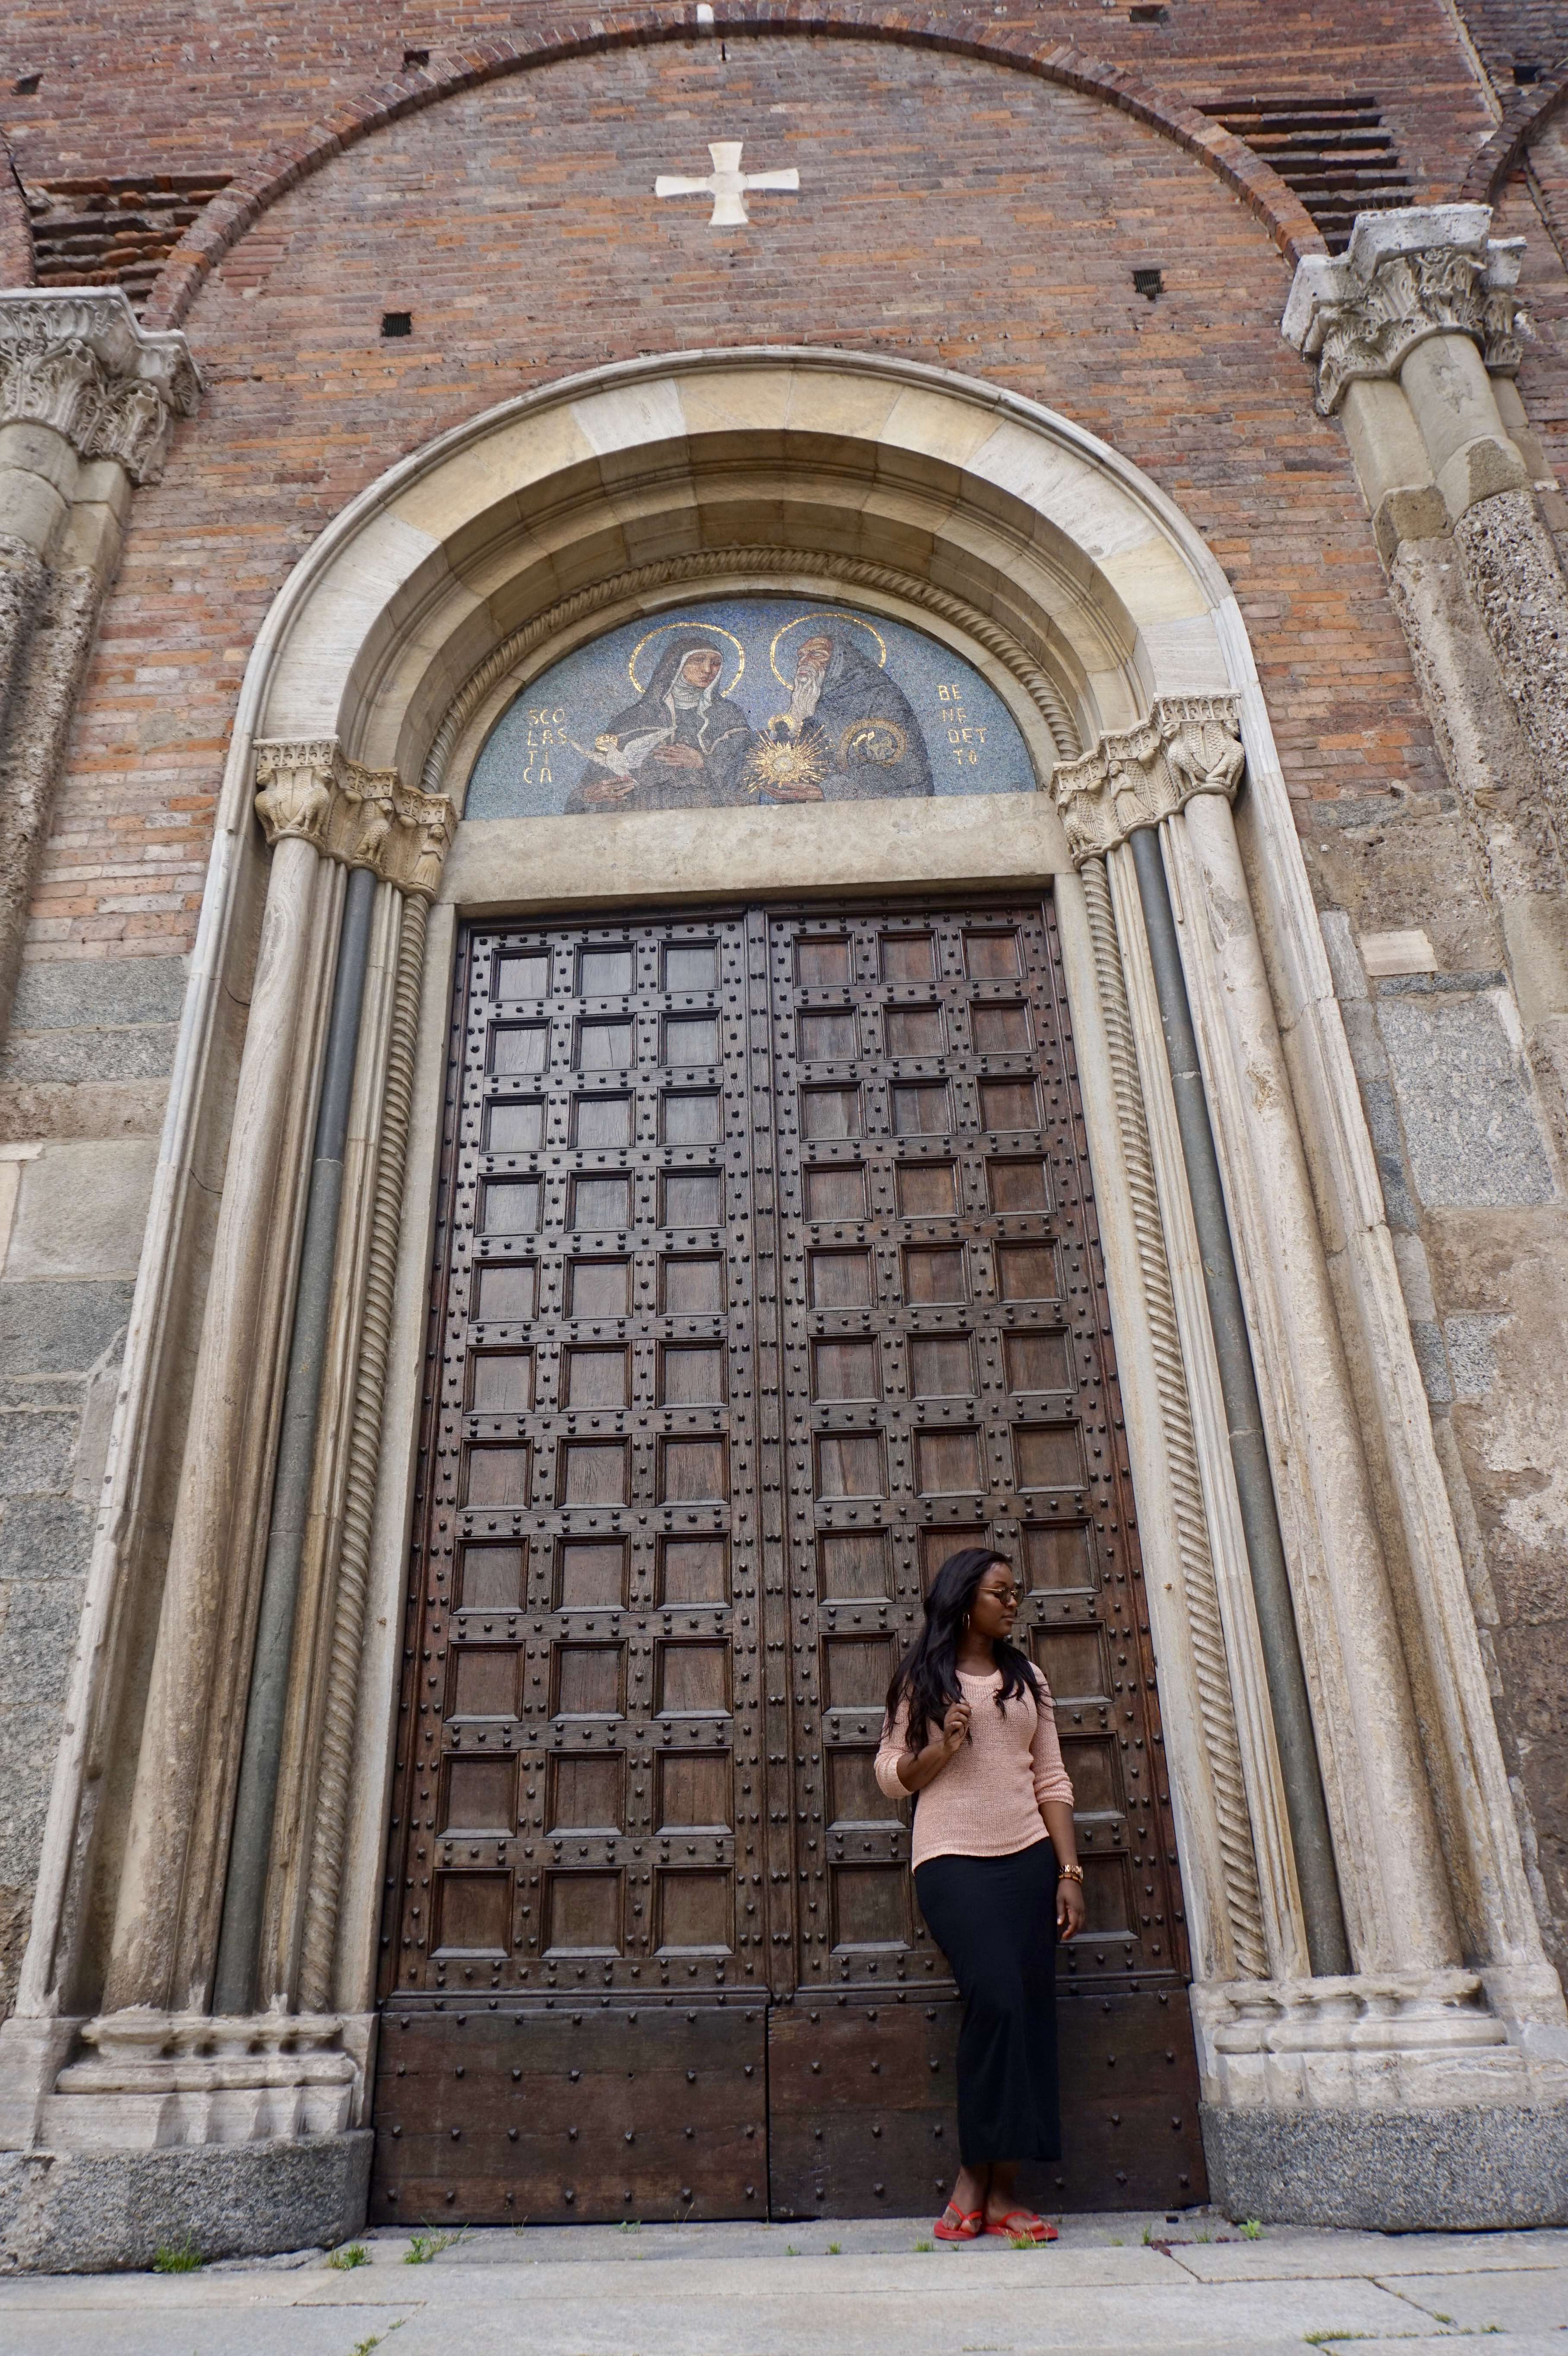 raychel-says-travel-church-doorway-brown-milan-2017-images